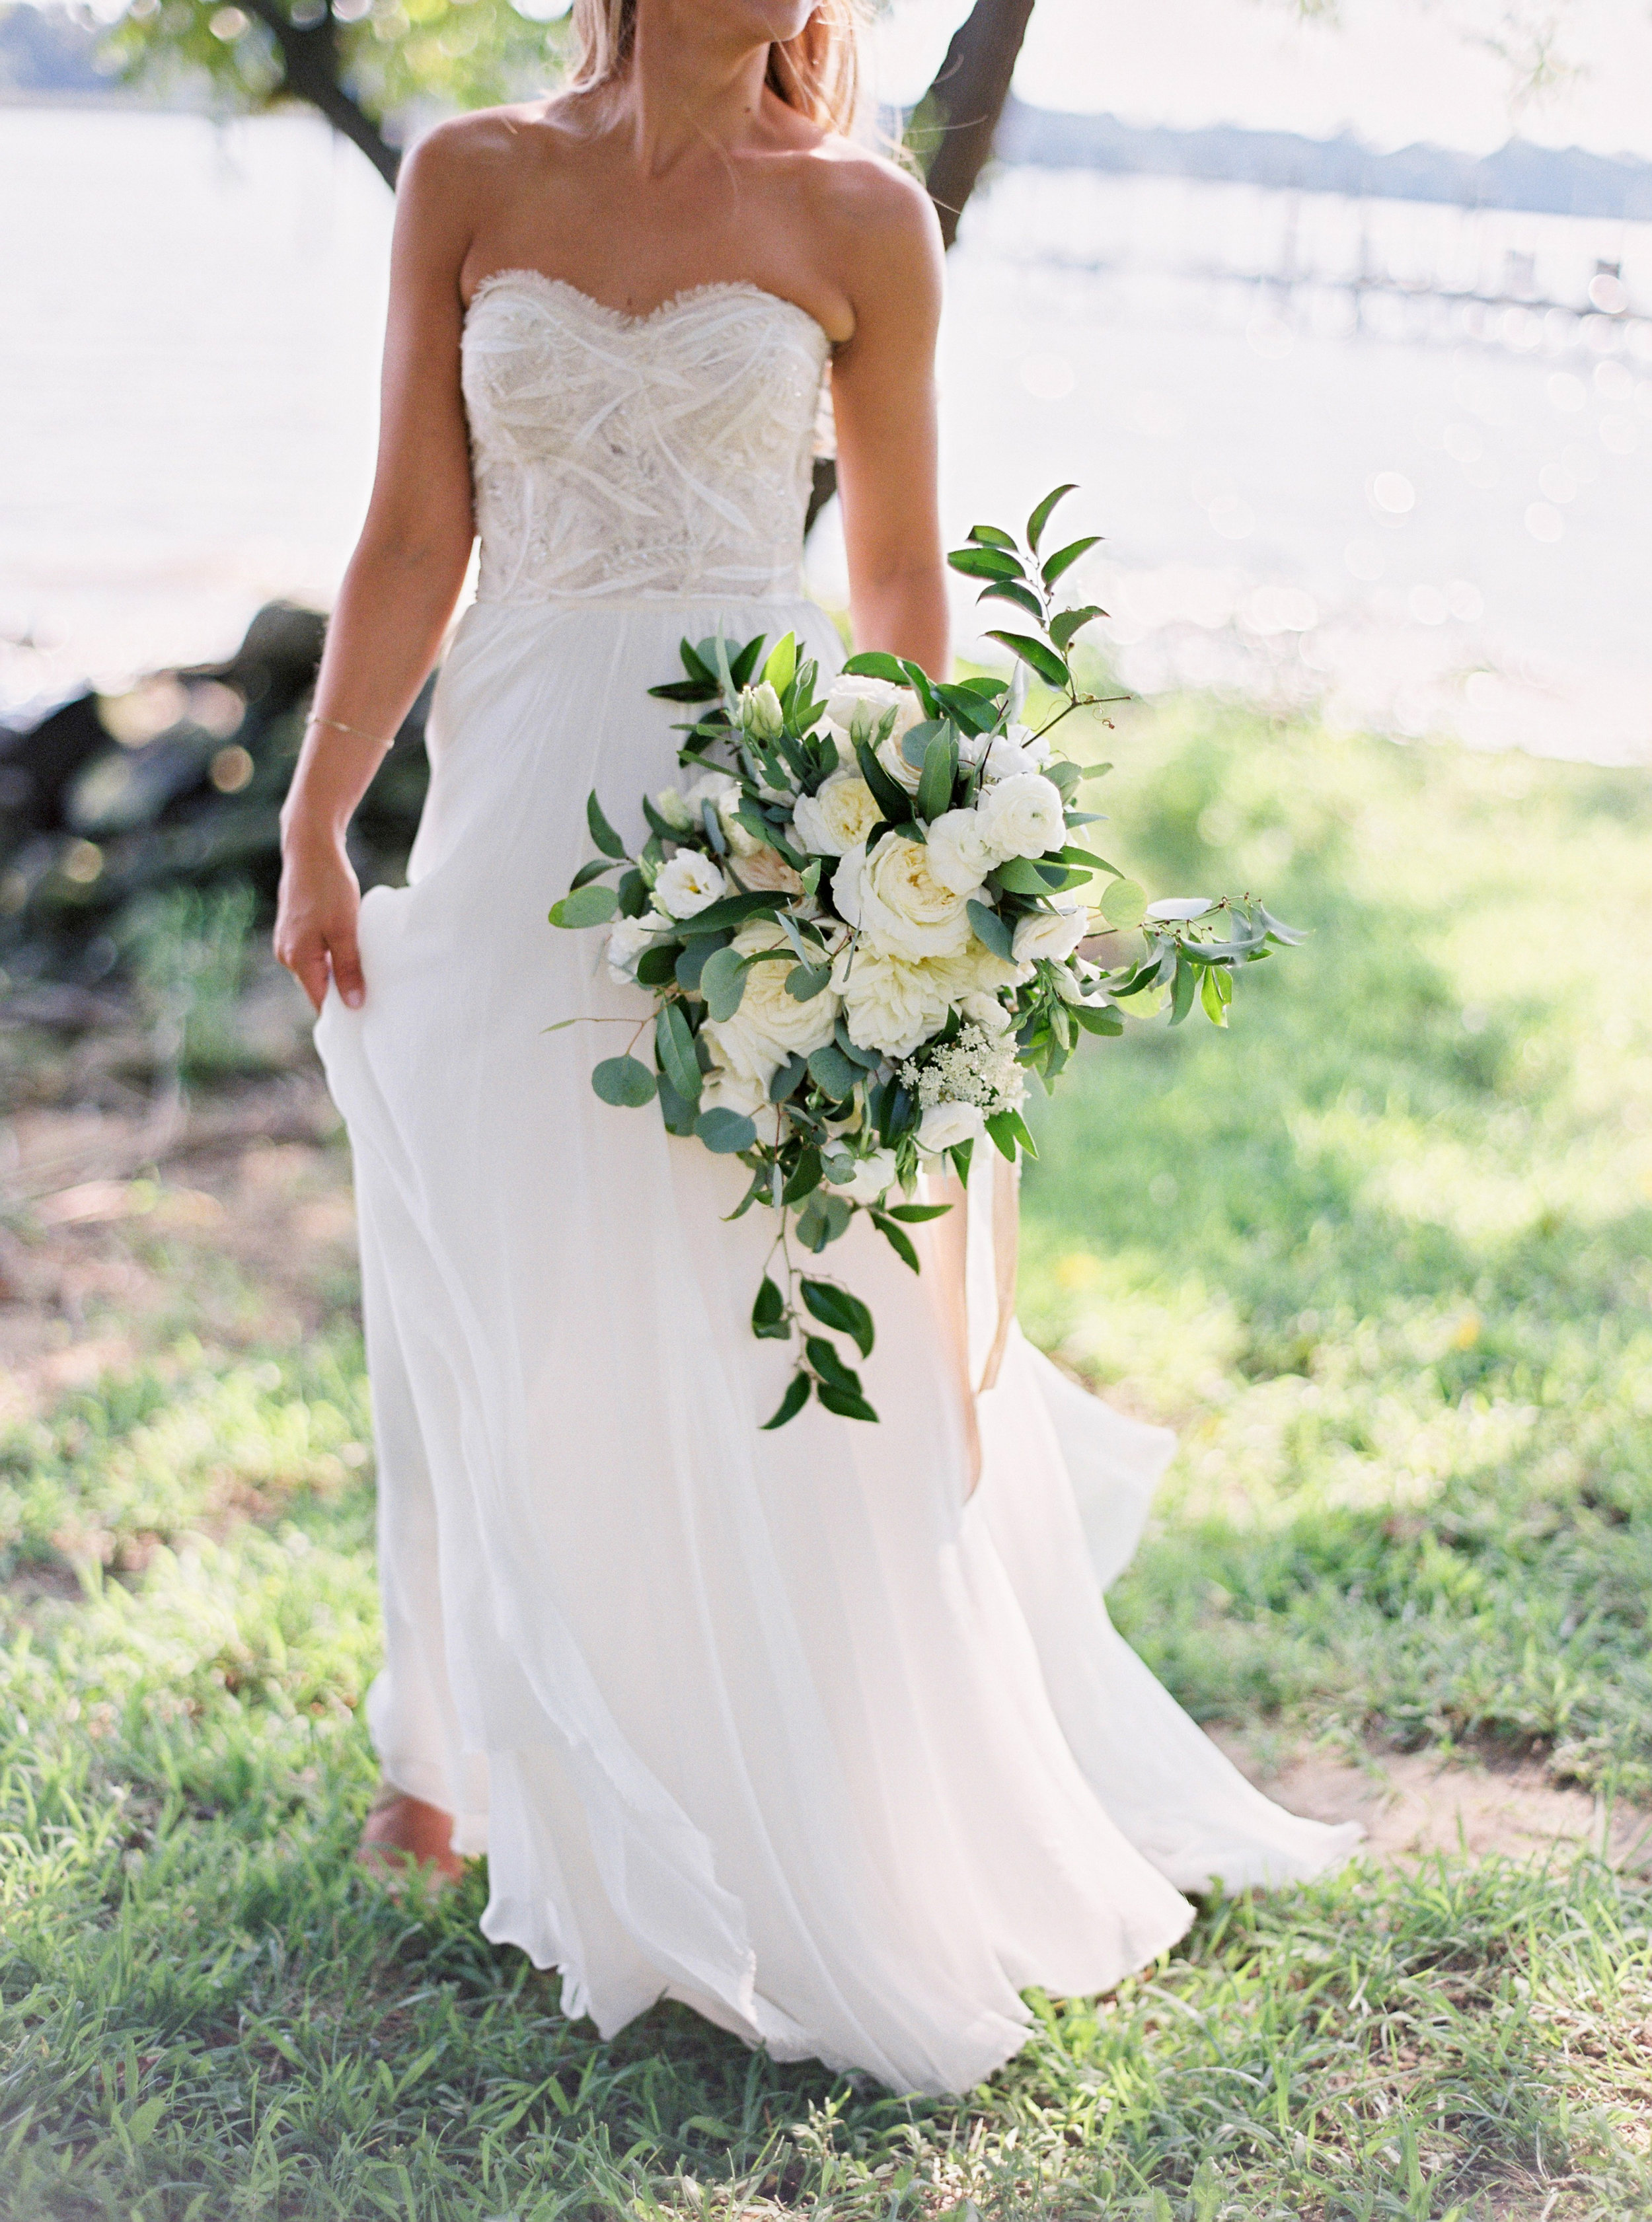 amelia_johnson_photography_Rachel&Ben_Wedding00213 copy 2.jpg